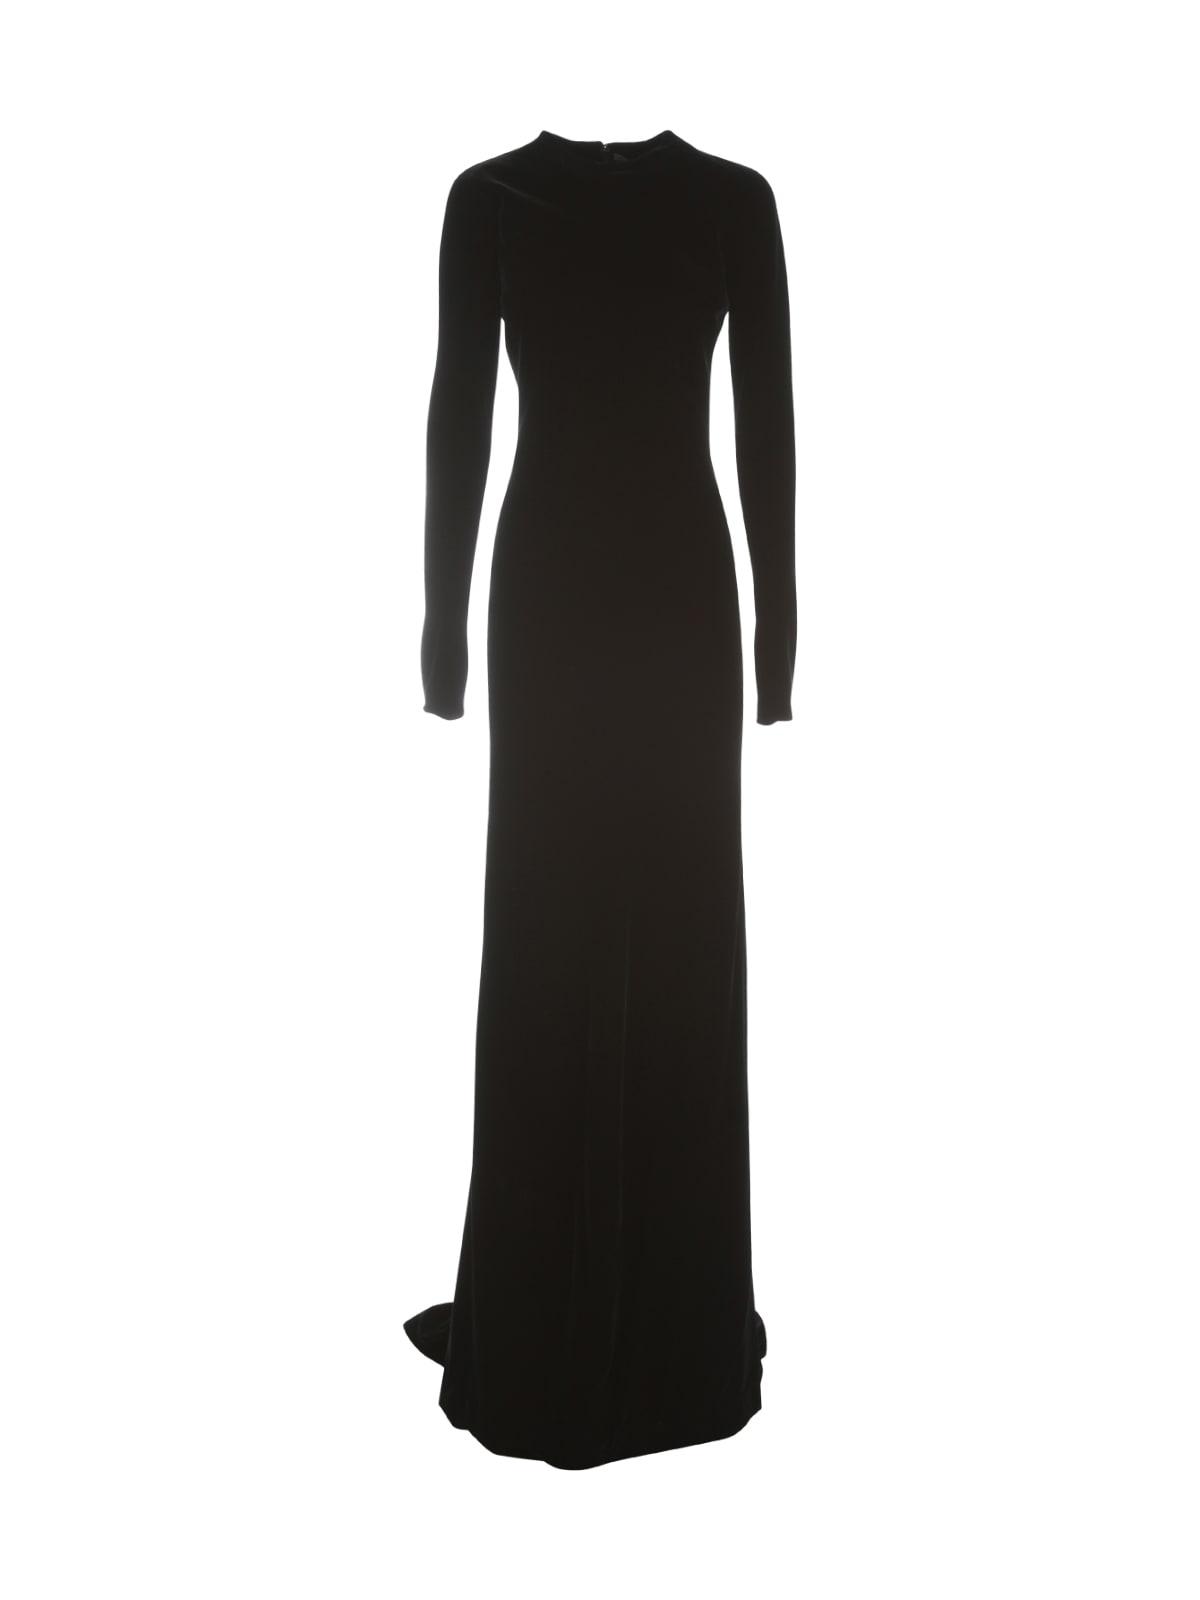 Buy Haider Ackermann Sirene Dress Uta online, shop Haider Ackermann with free shipping